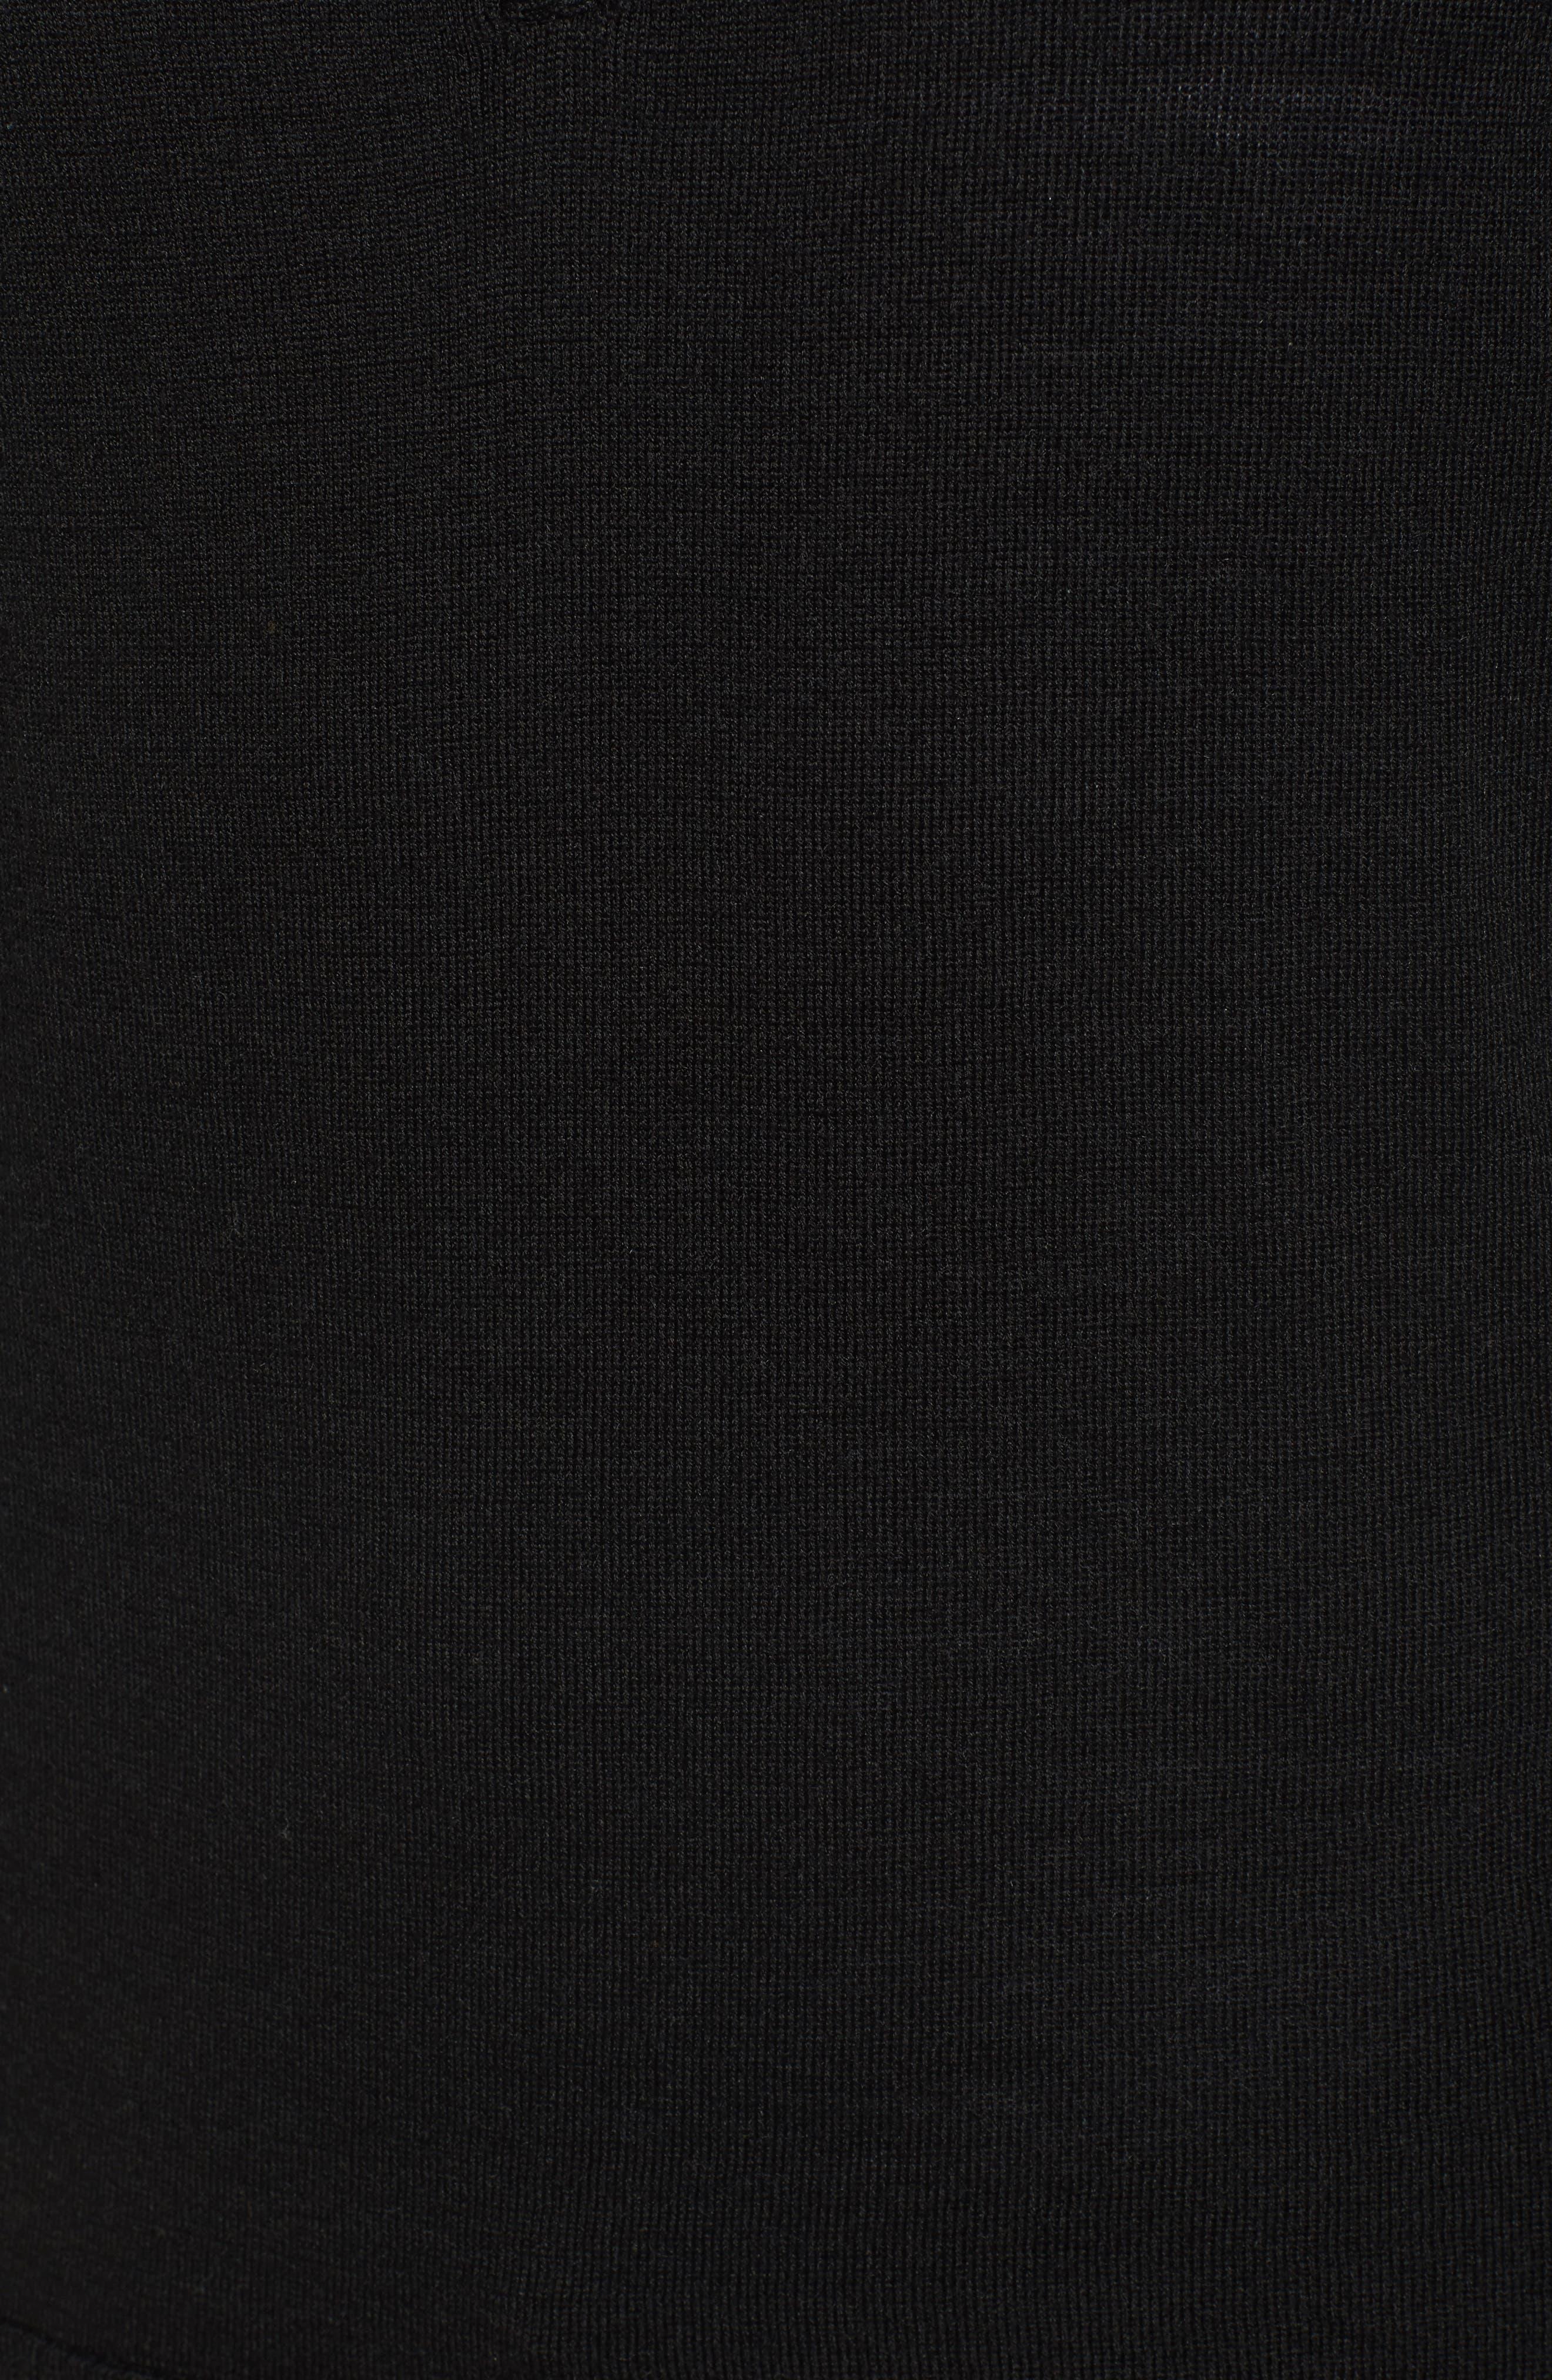 Kiva Ridge Merino Wool Blend Pullover,                             Alternate thumbnail 5, color,                             001